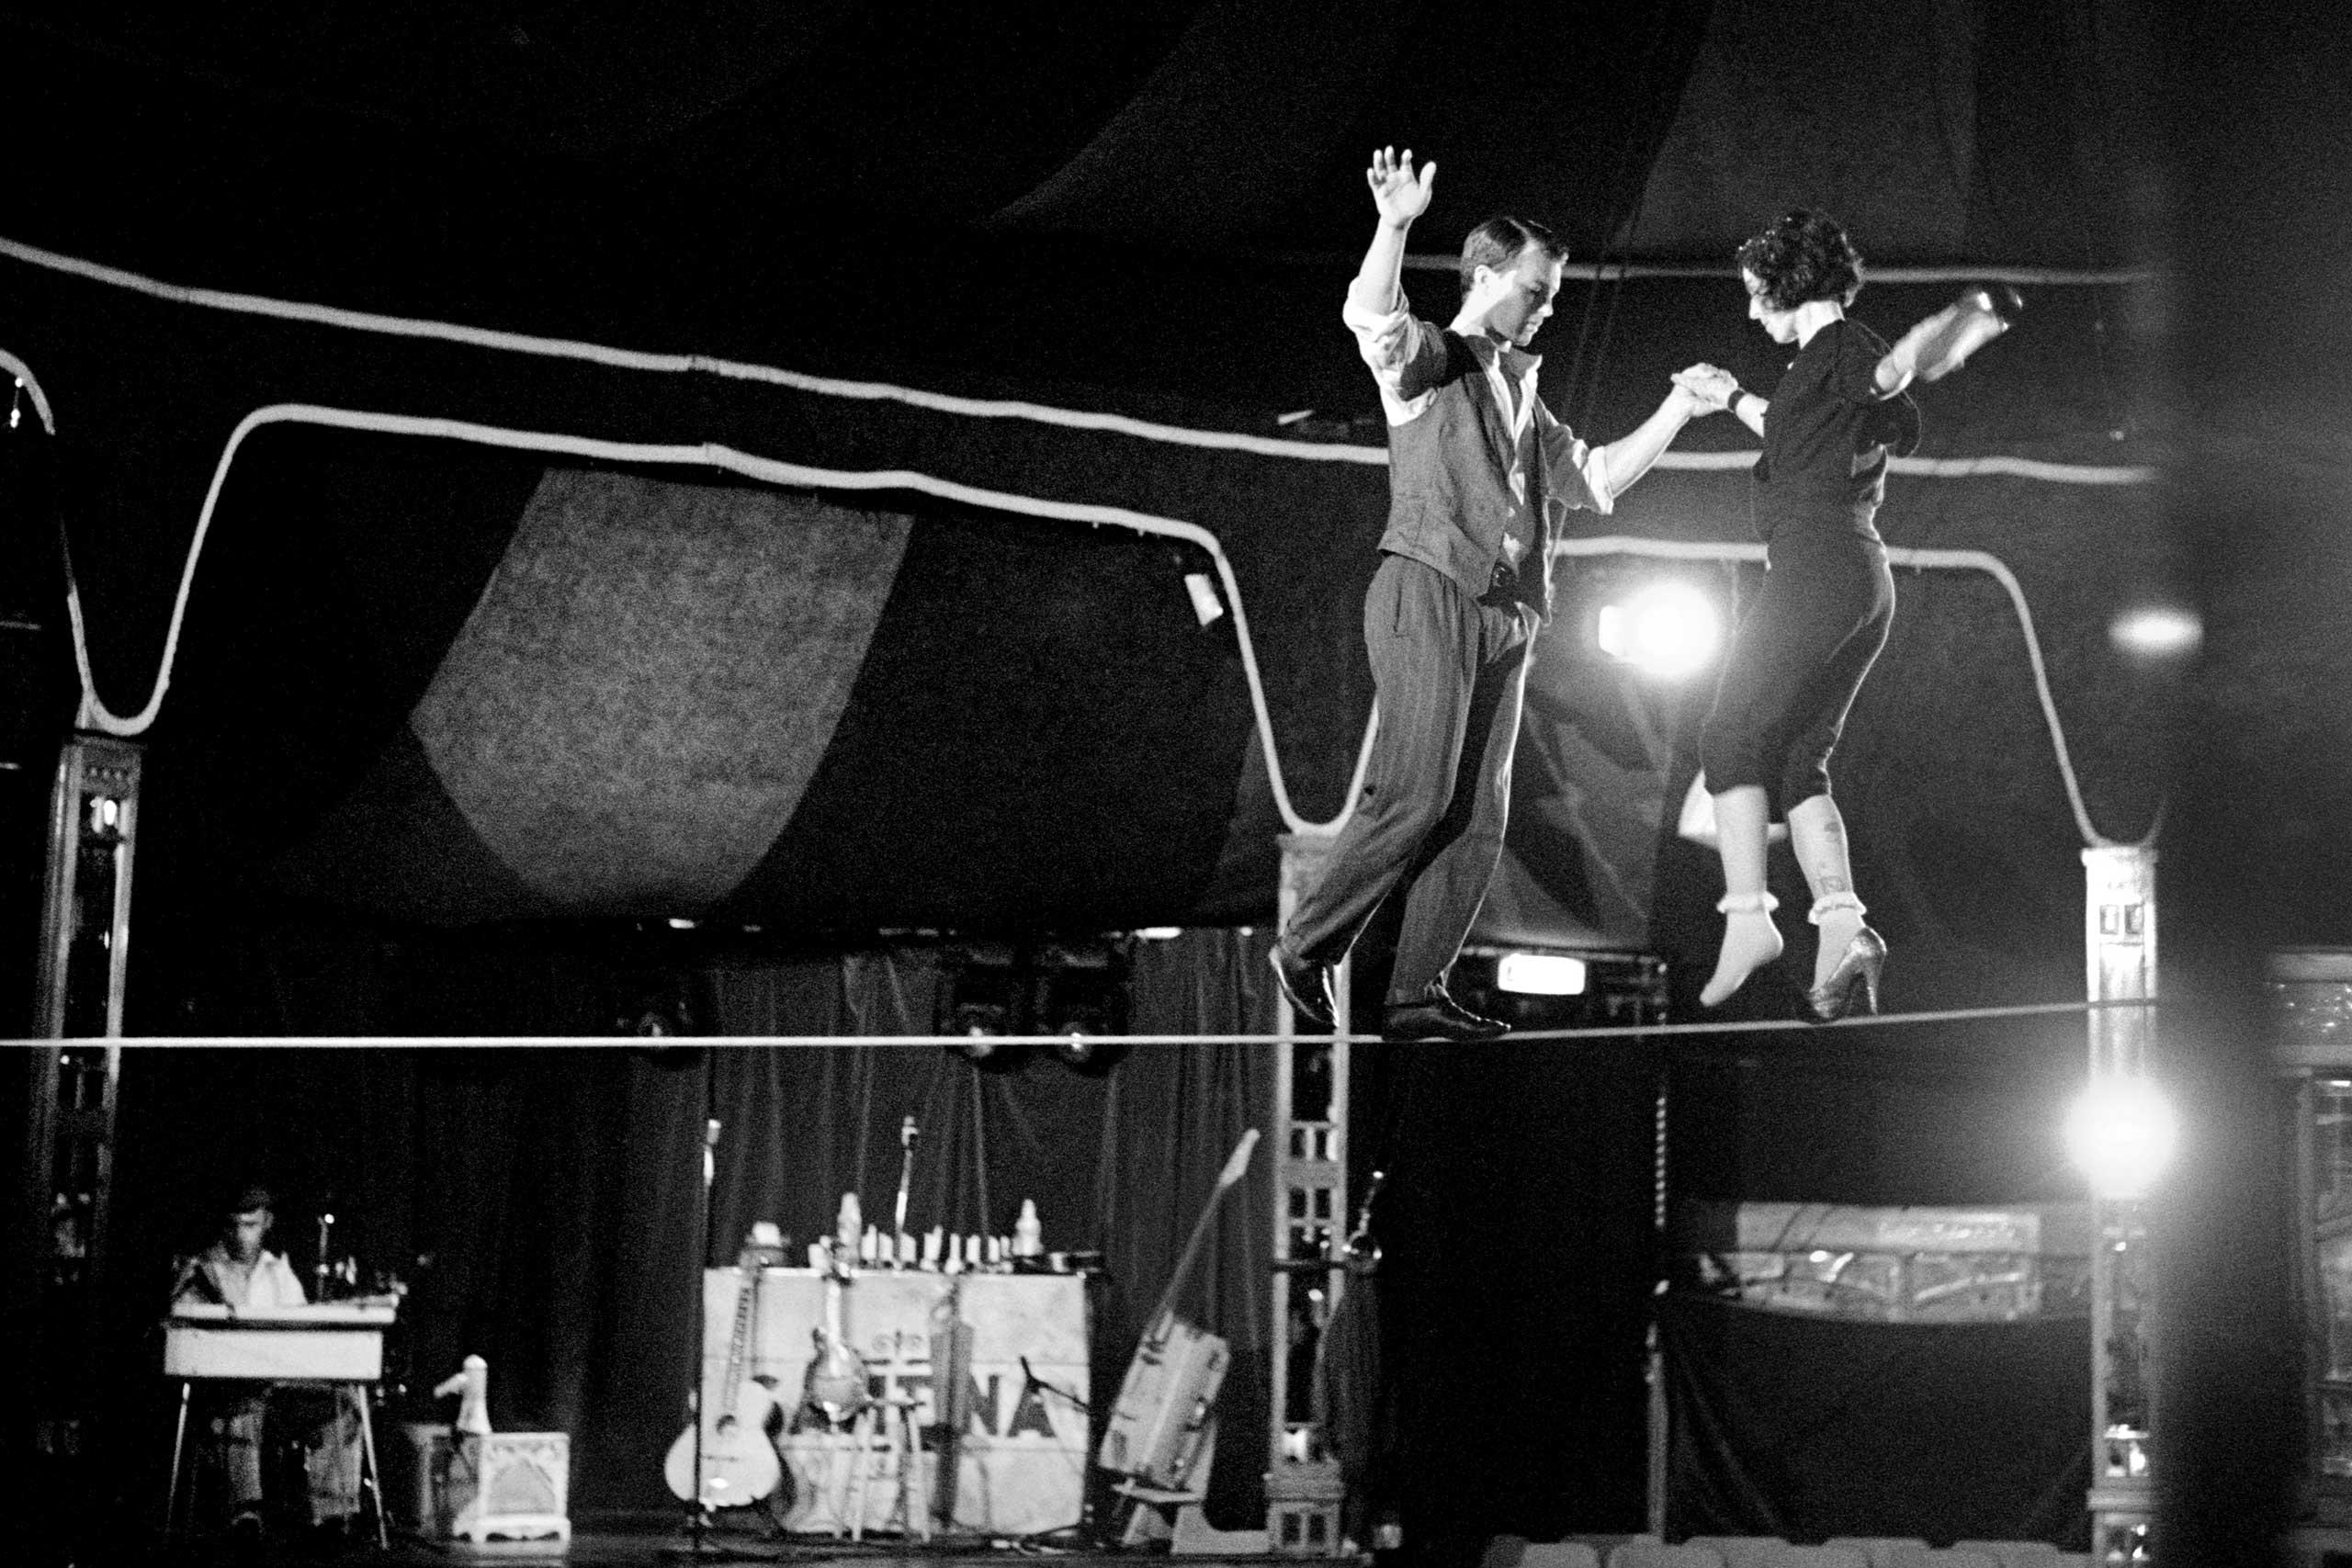 Dance on Tightrope, London, 2012